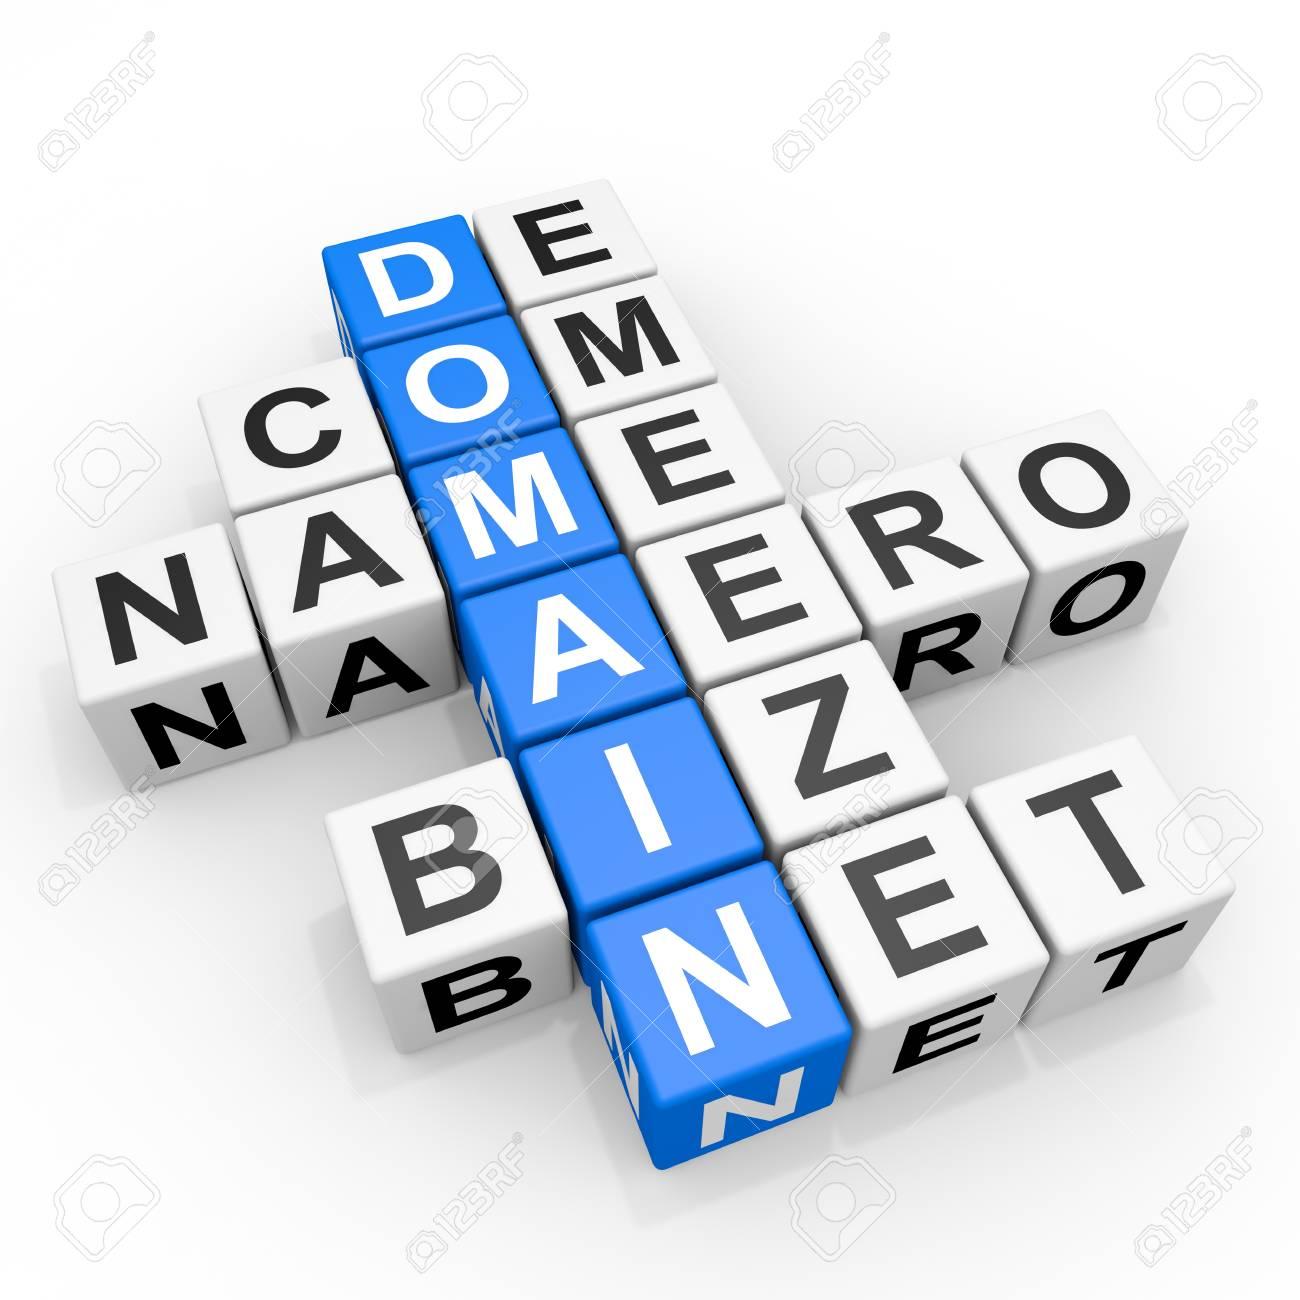 DOMAIN crossword. Computer generated image. Stock Photo - 12839049